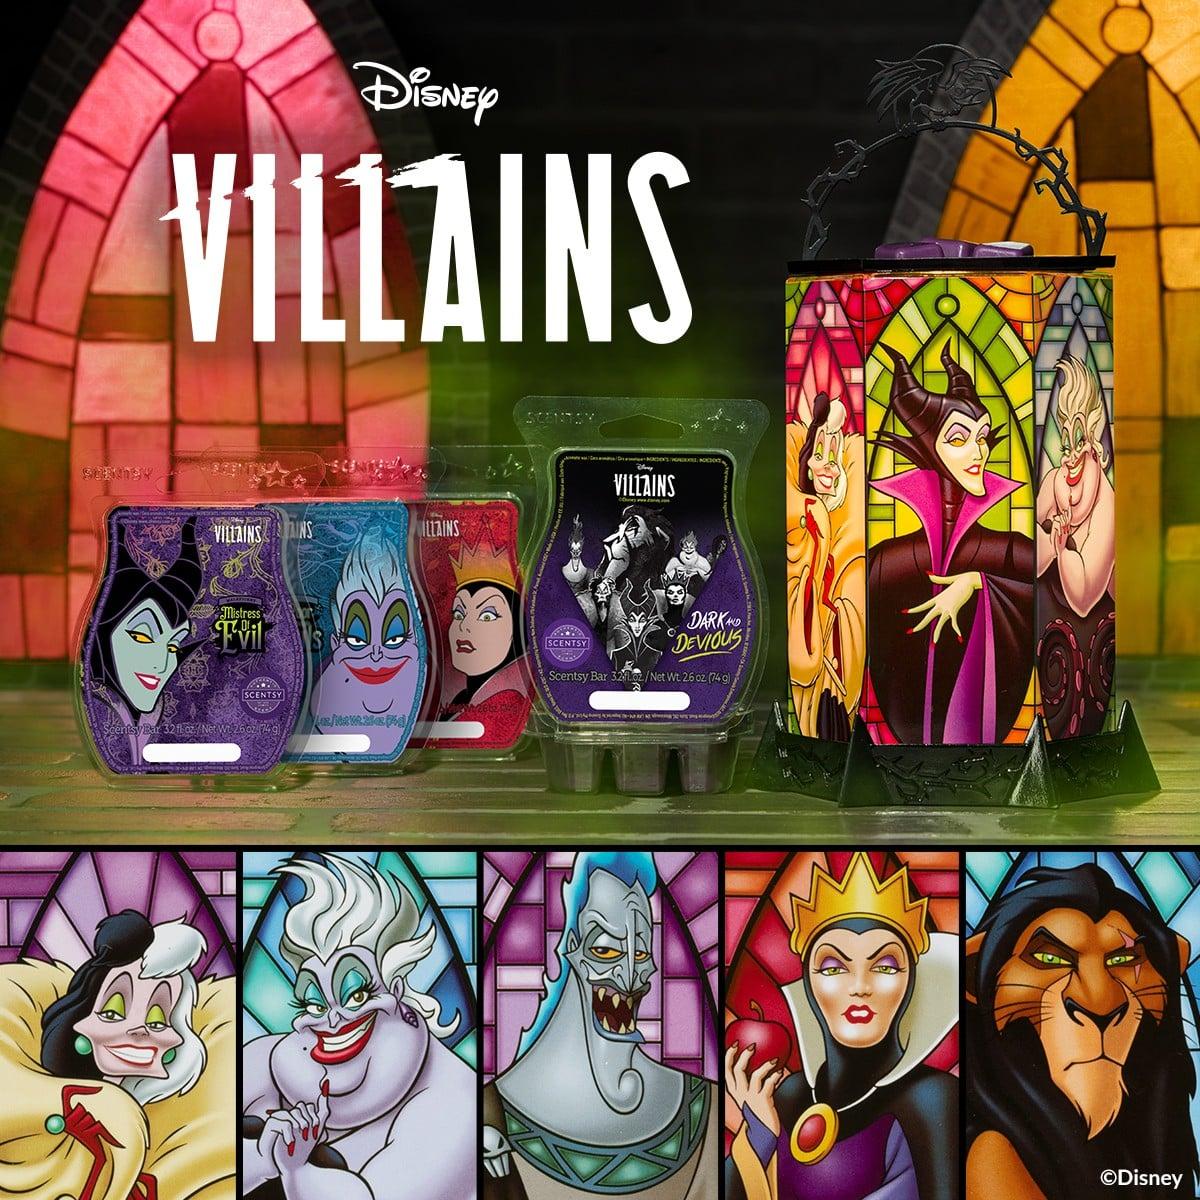 Disney Villains All the Rage Scentsy Warmer & Wax